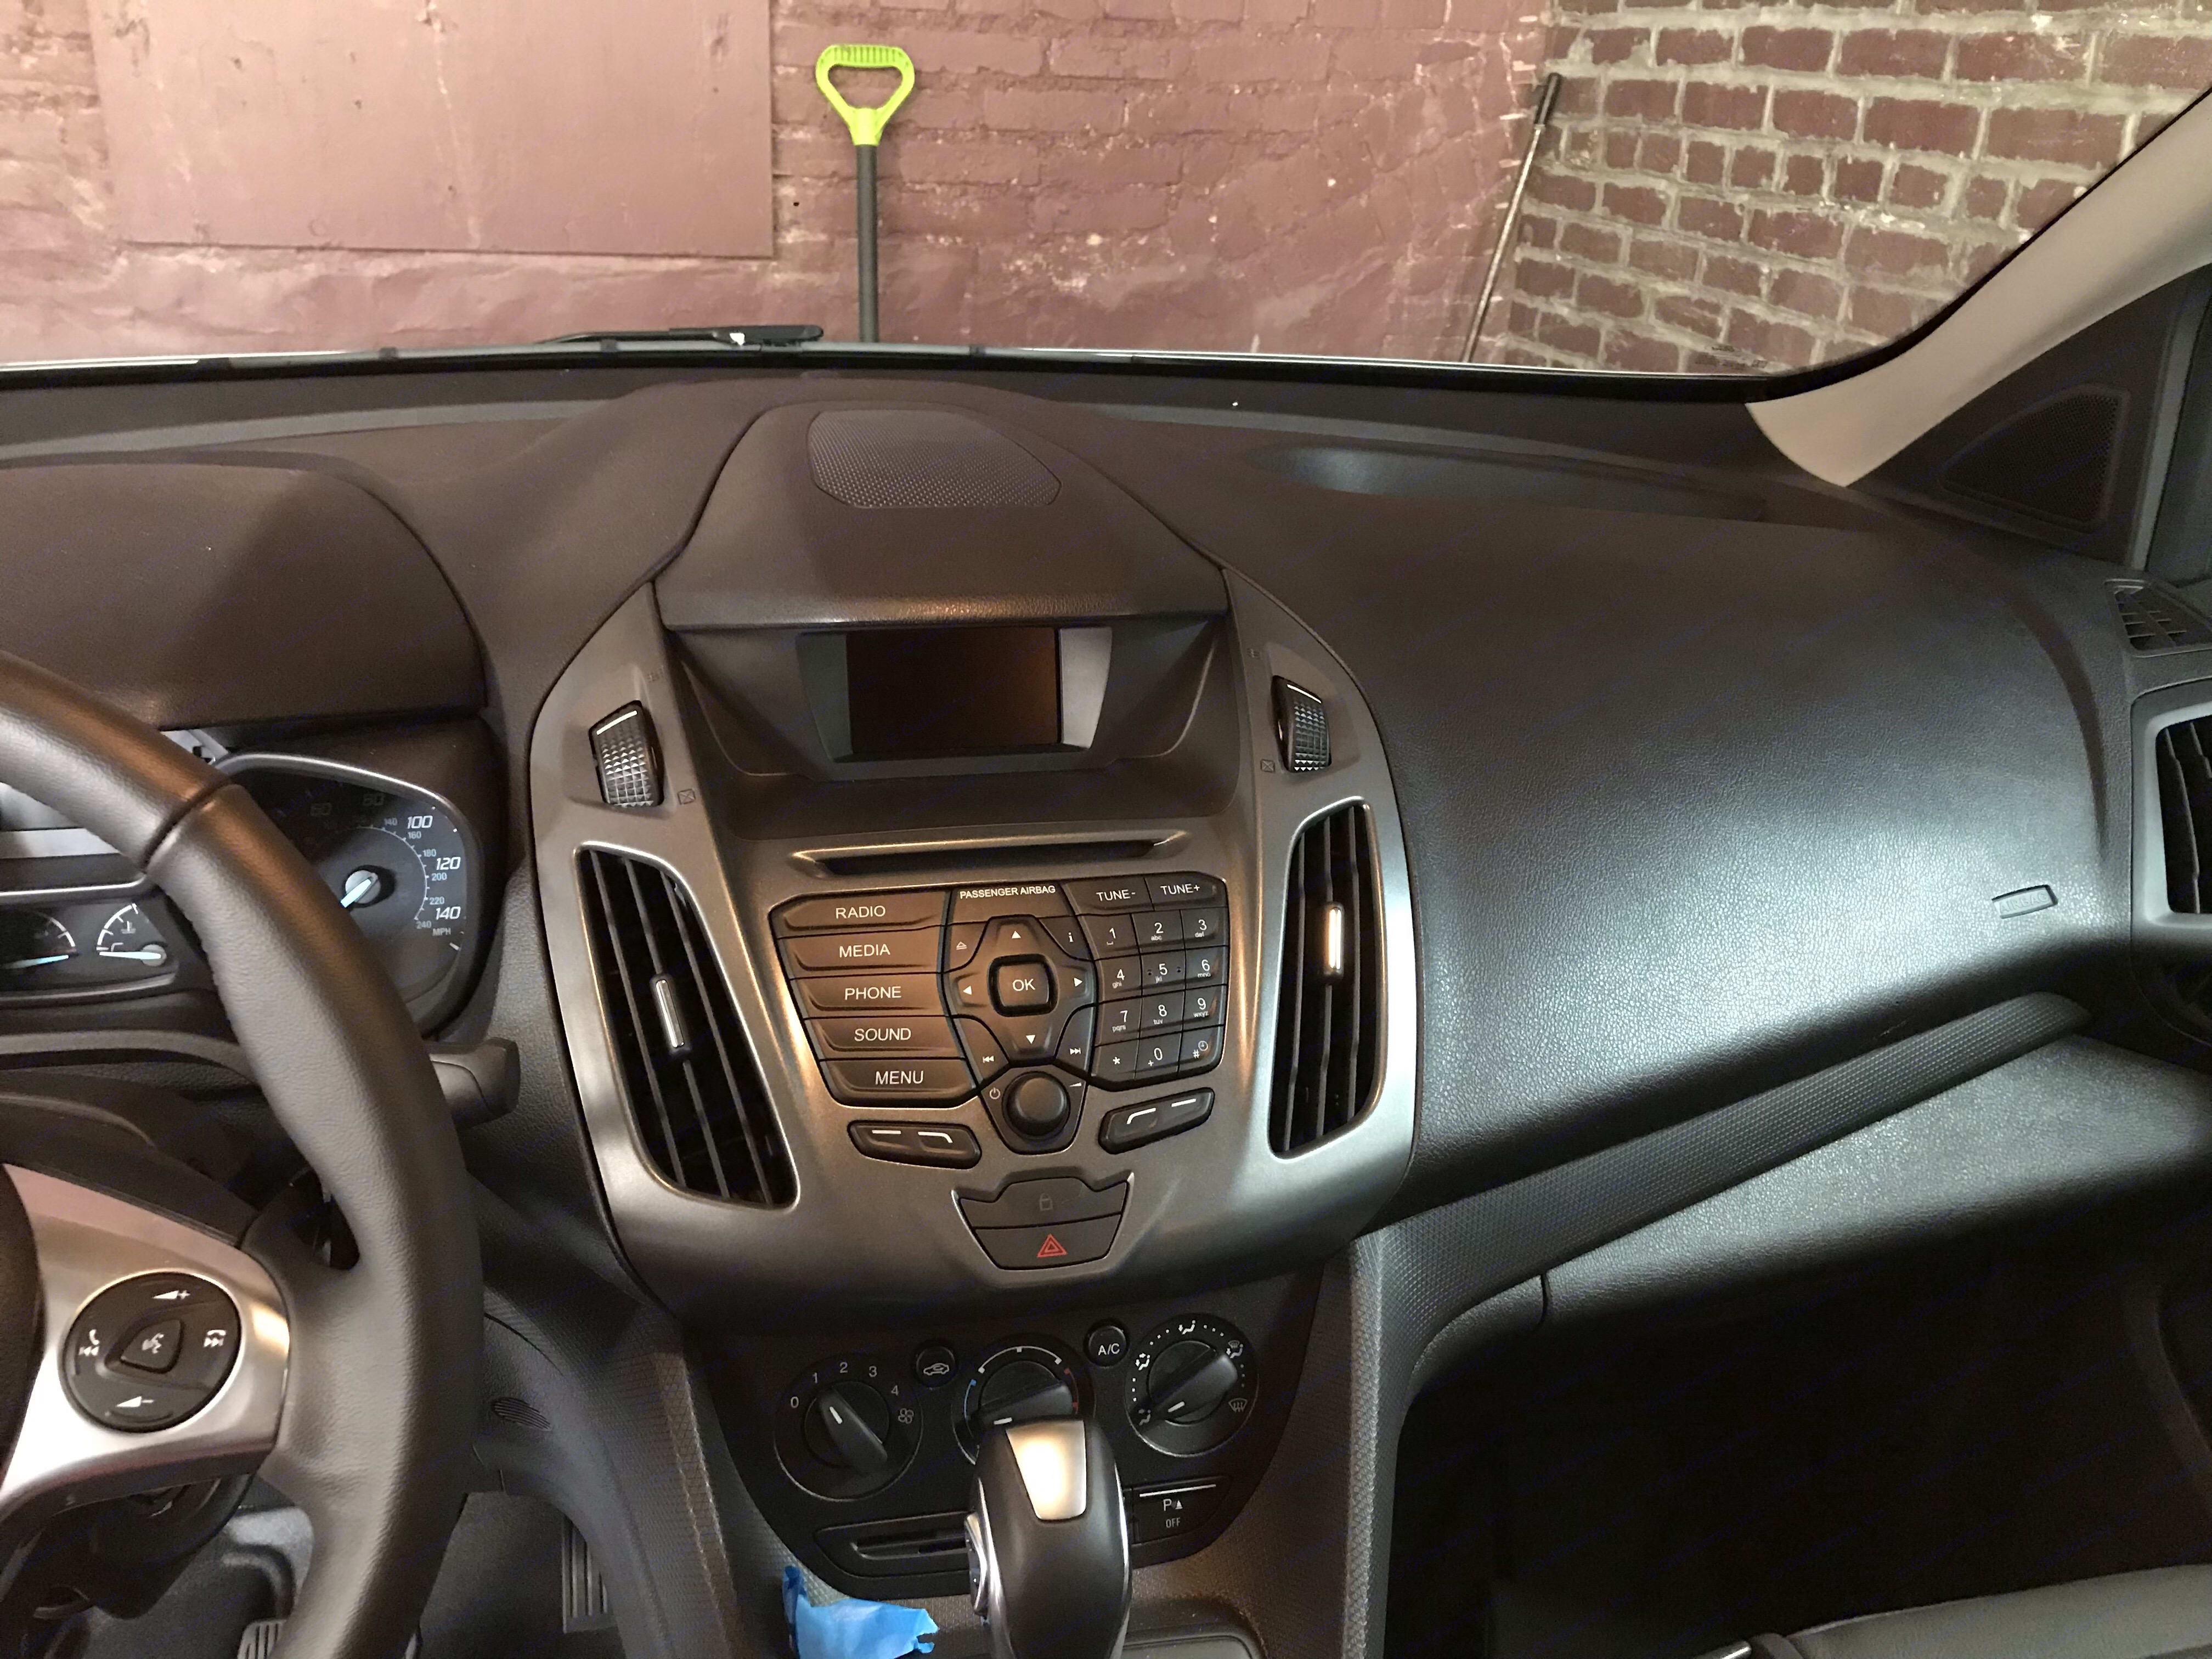 Bluetooth, backup camera, CD player. Ford Transit Custom 2018